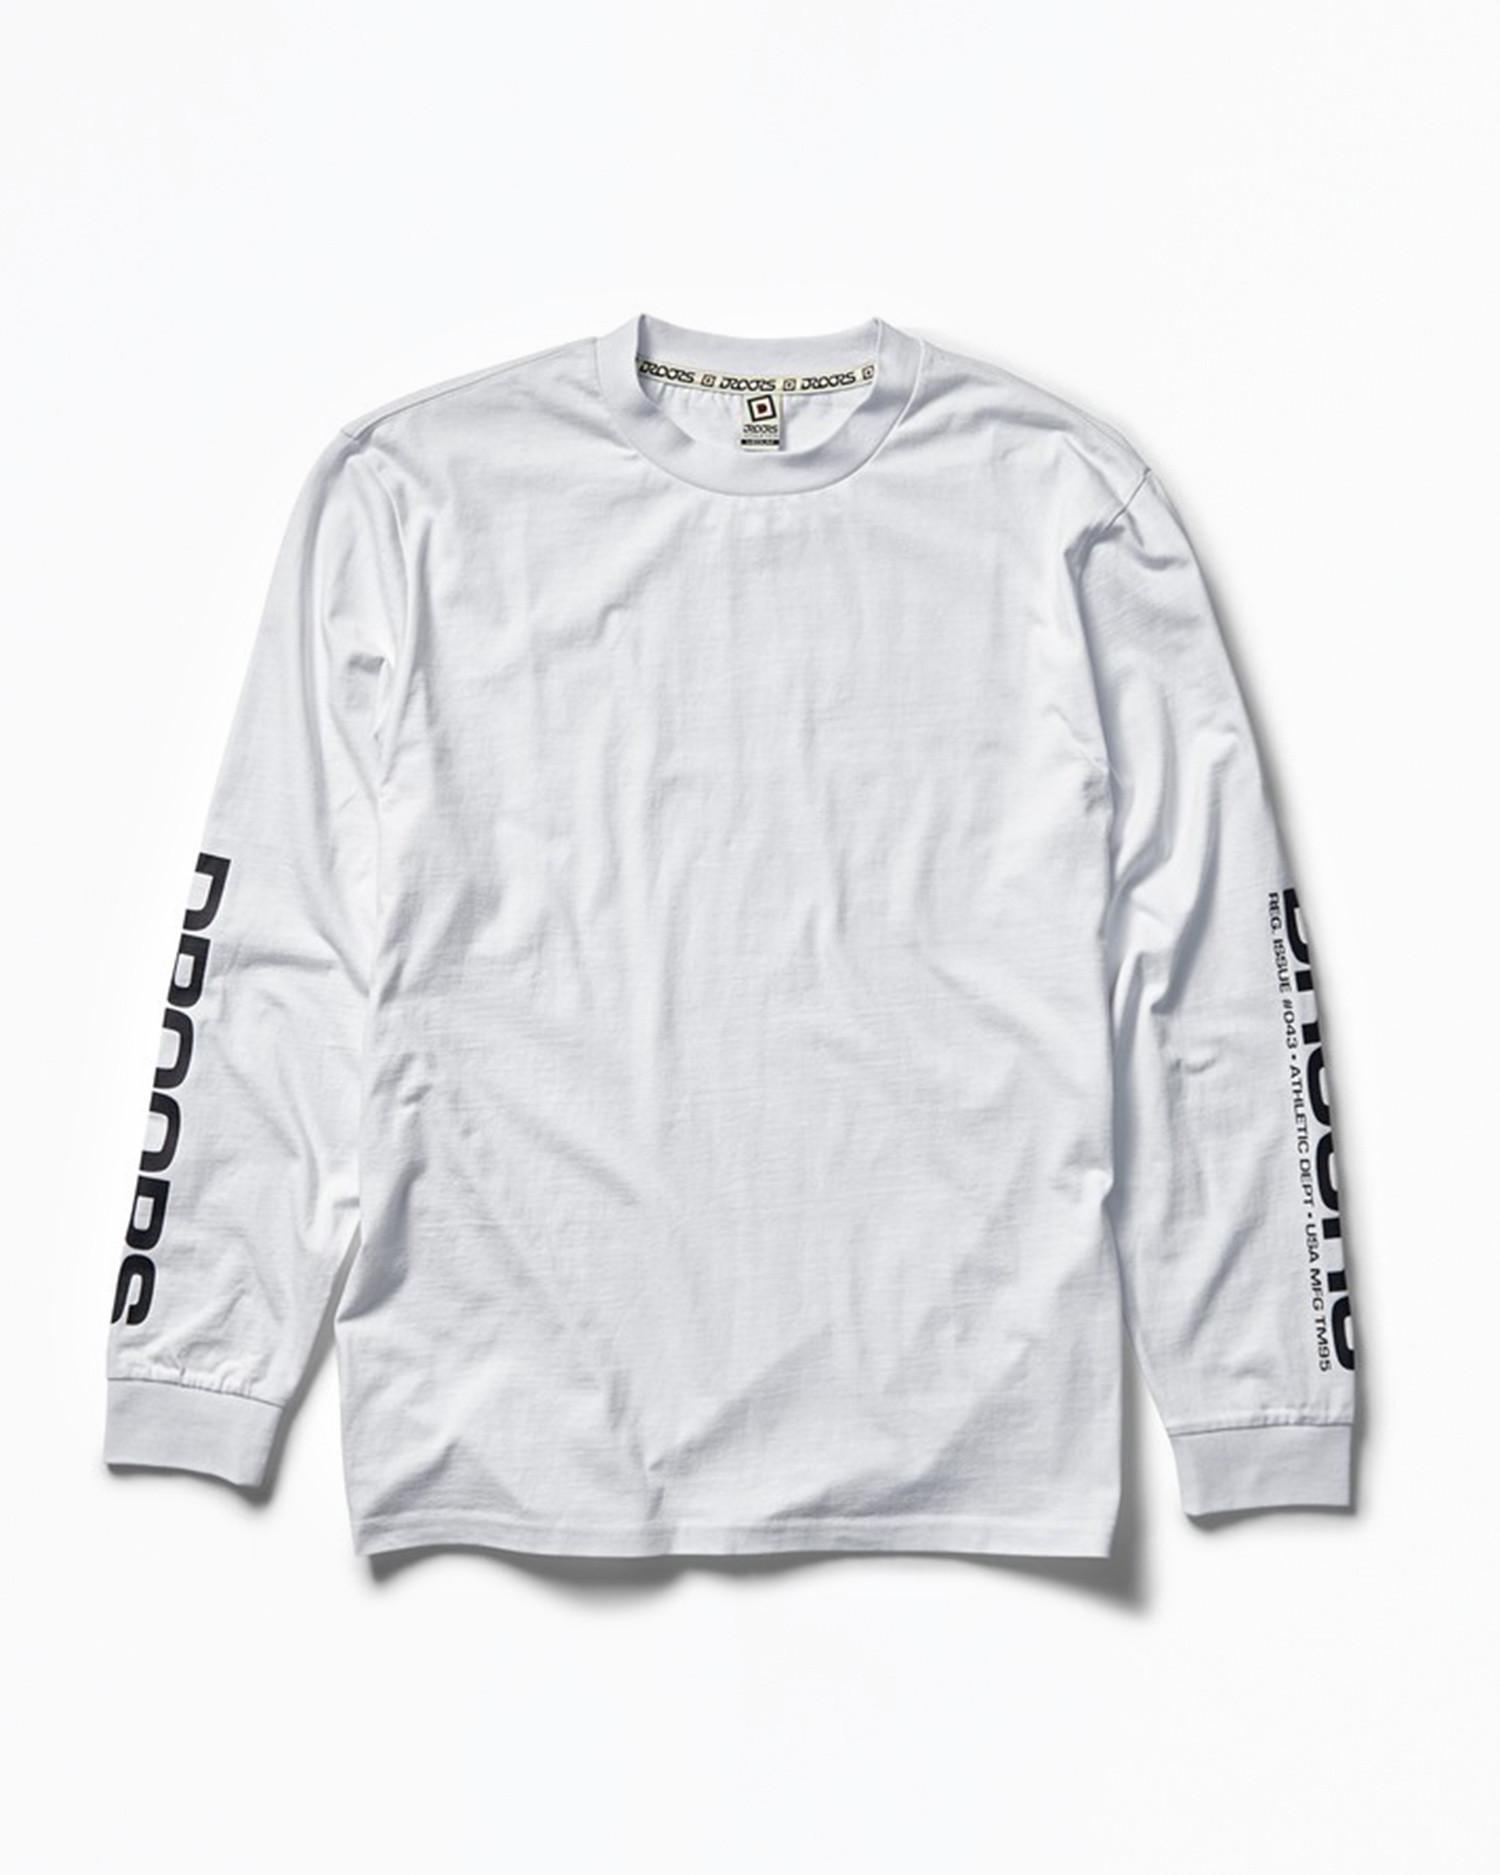 DROORS No. 42 Longsleeve T-Shirt White